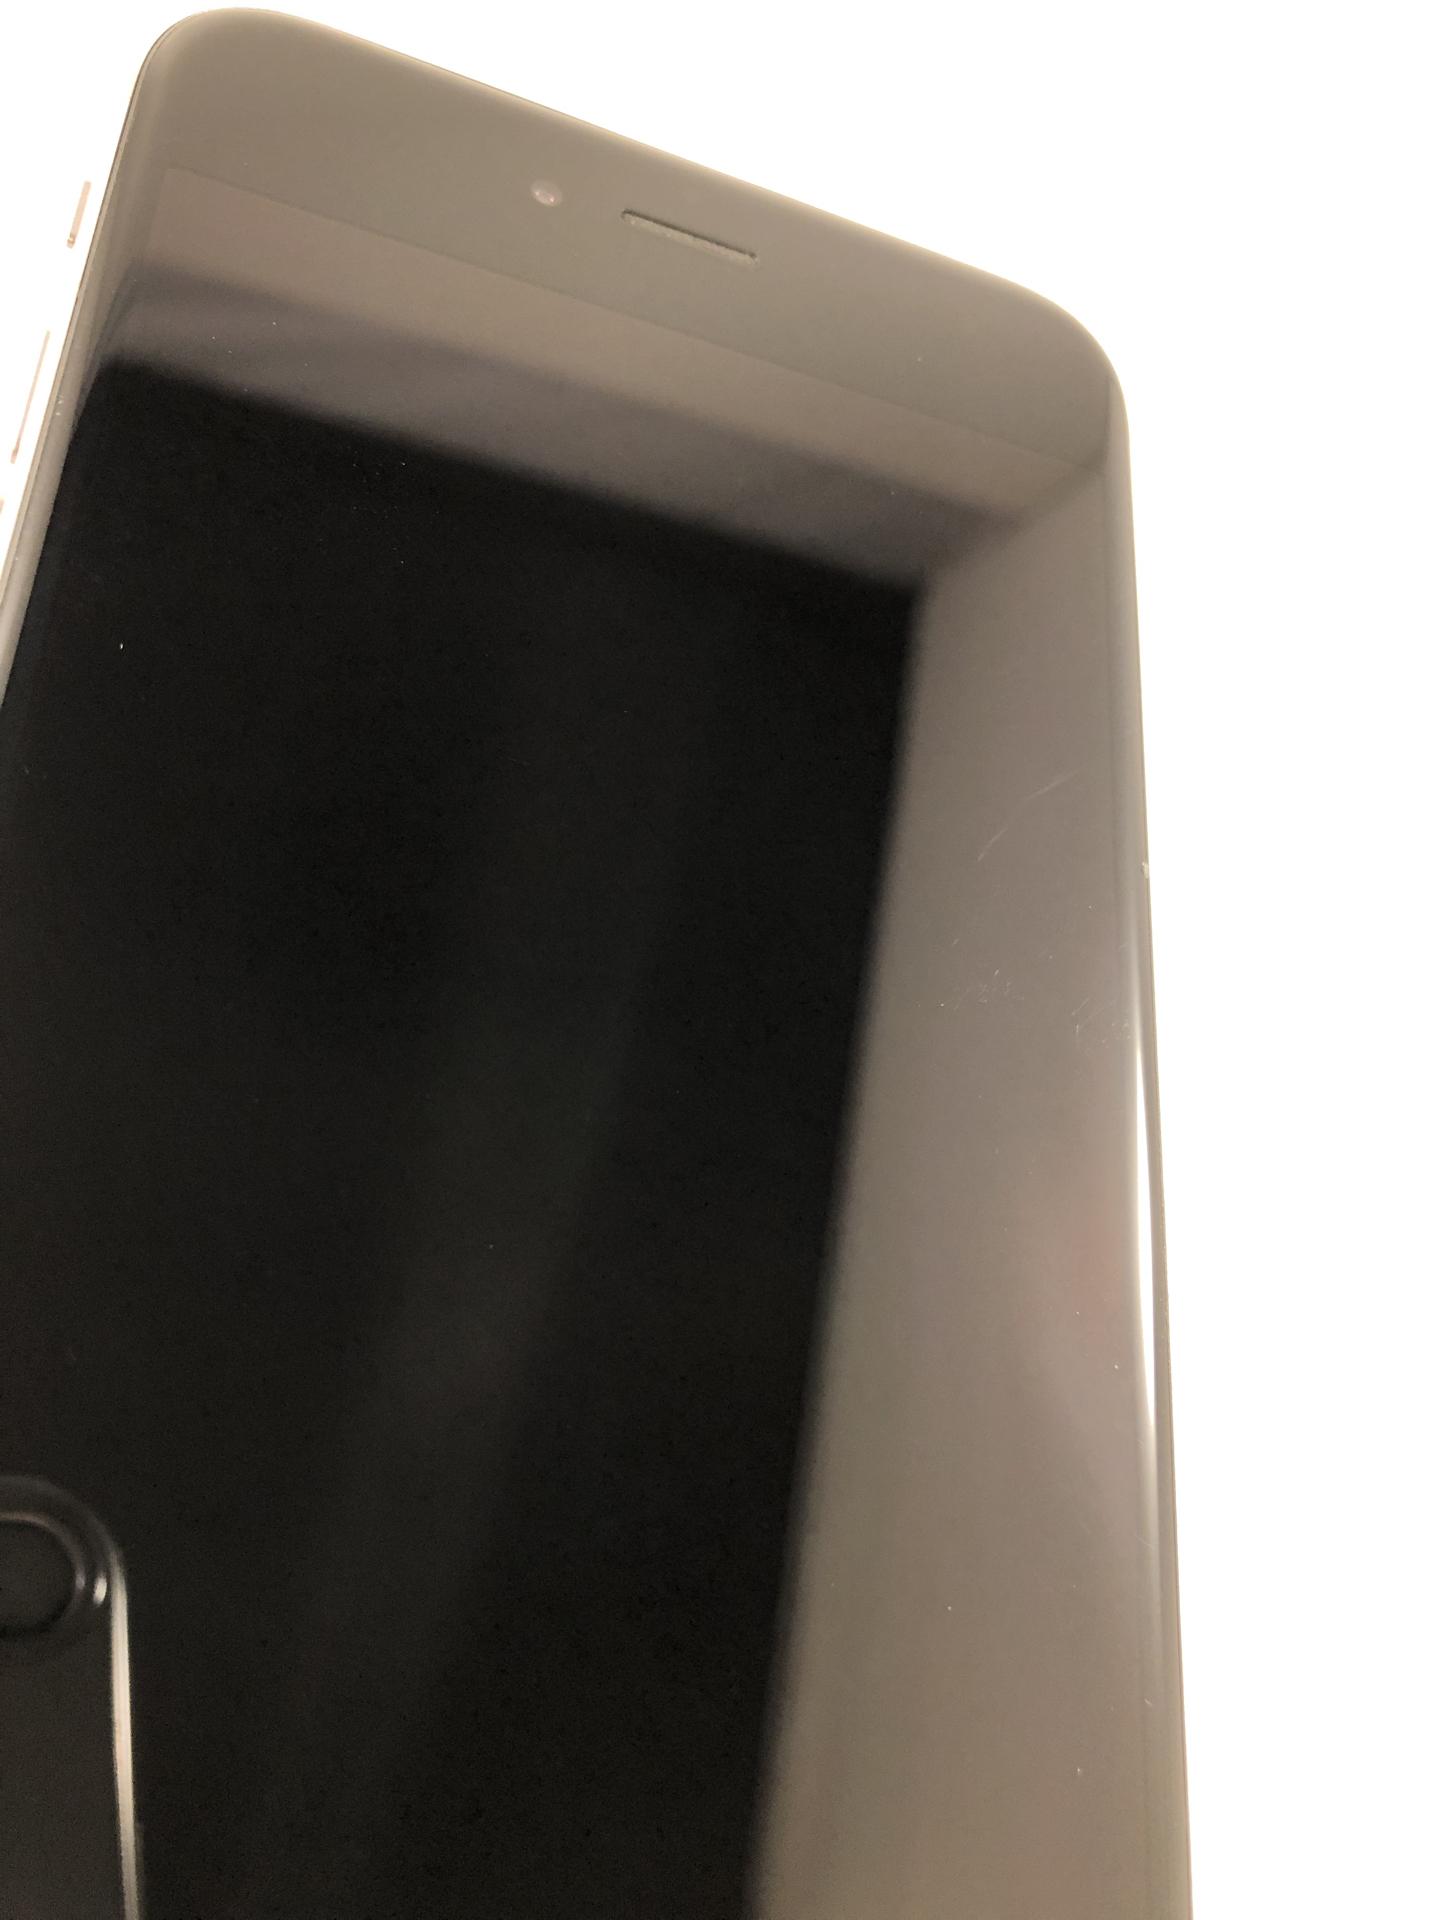 iPhone 6S Plus 64GB, 64GB, Space Gray, Kuva 3